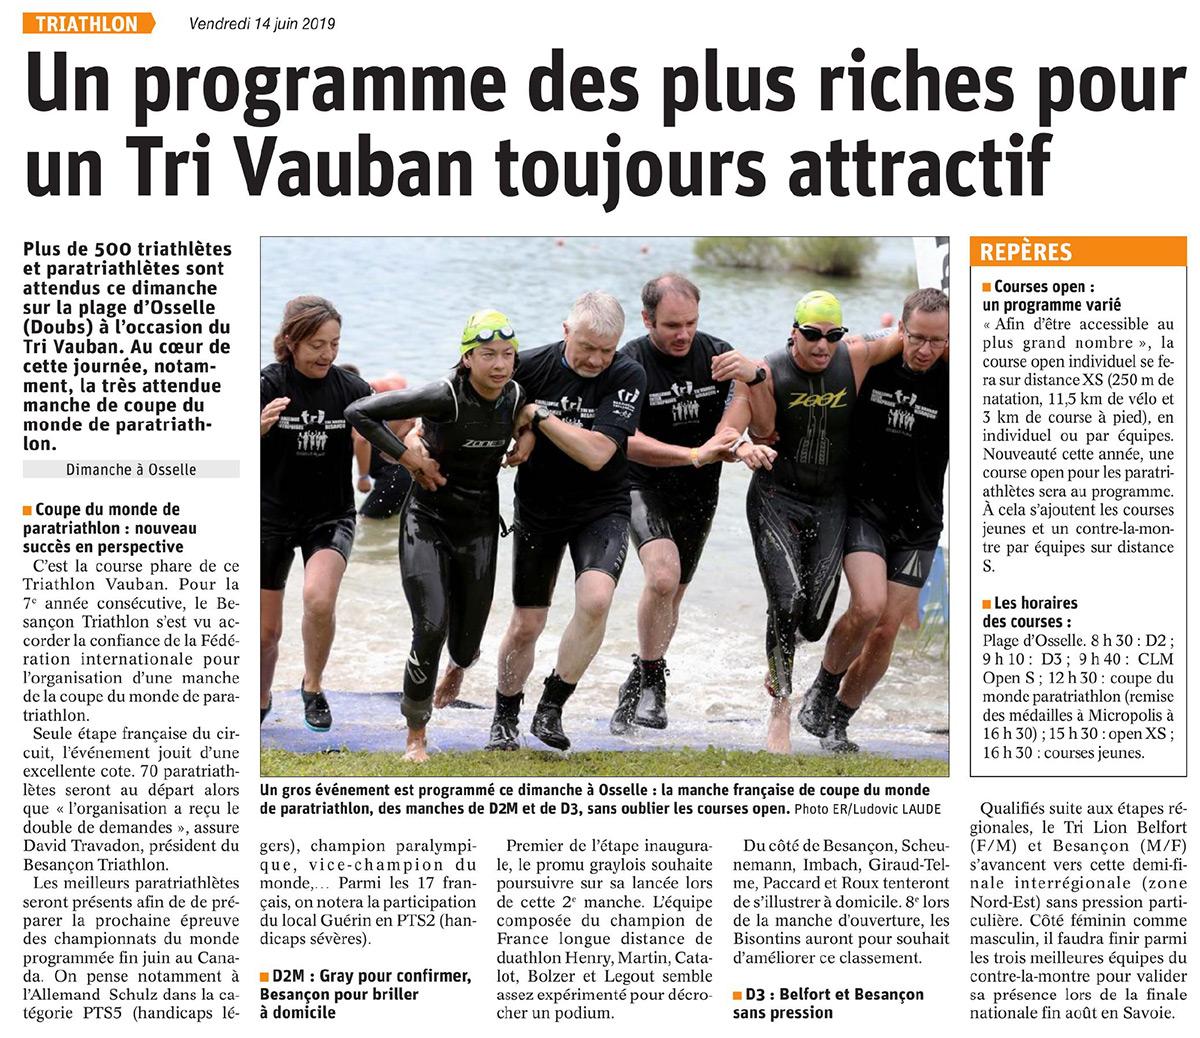 20190614 EST REP Besancon Triathlon Vauban